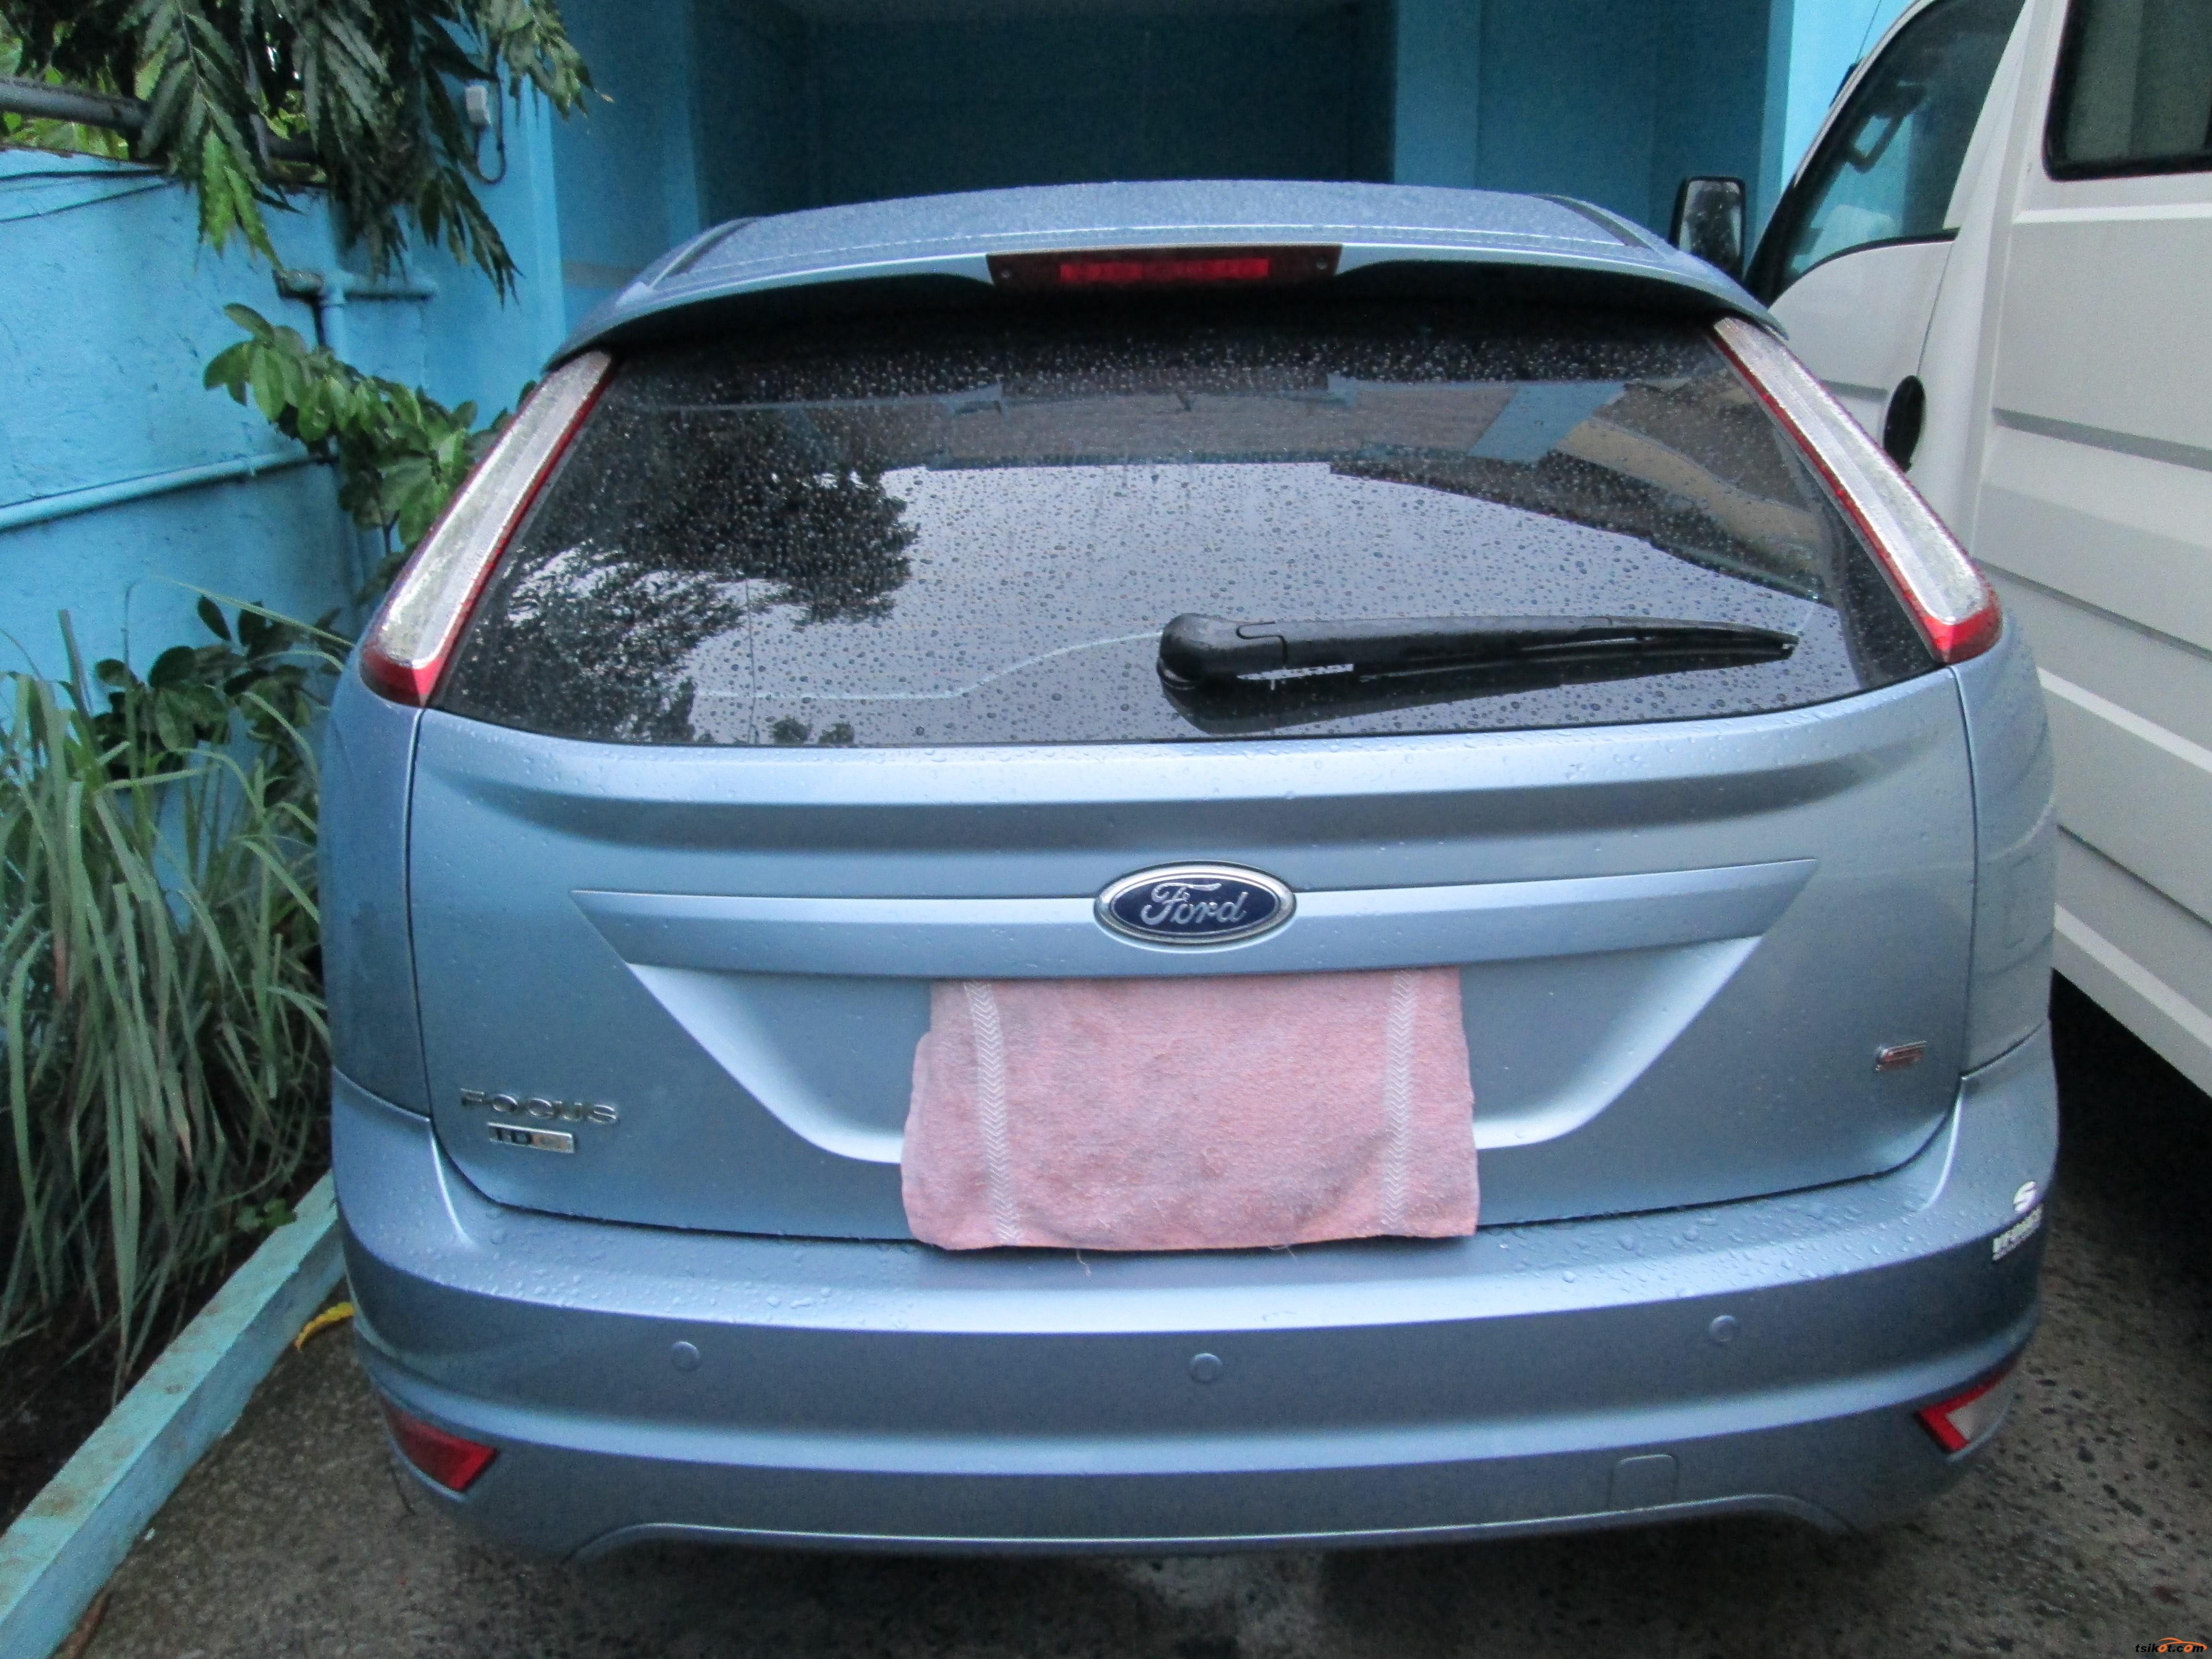 Ford Focus 2012 - 5